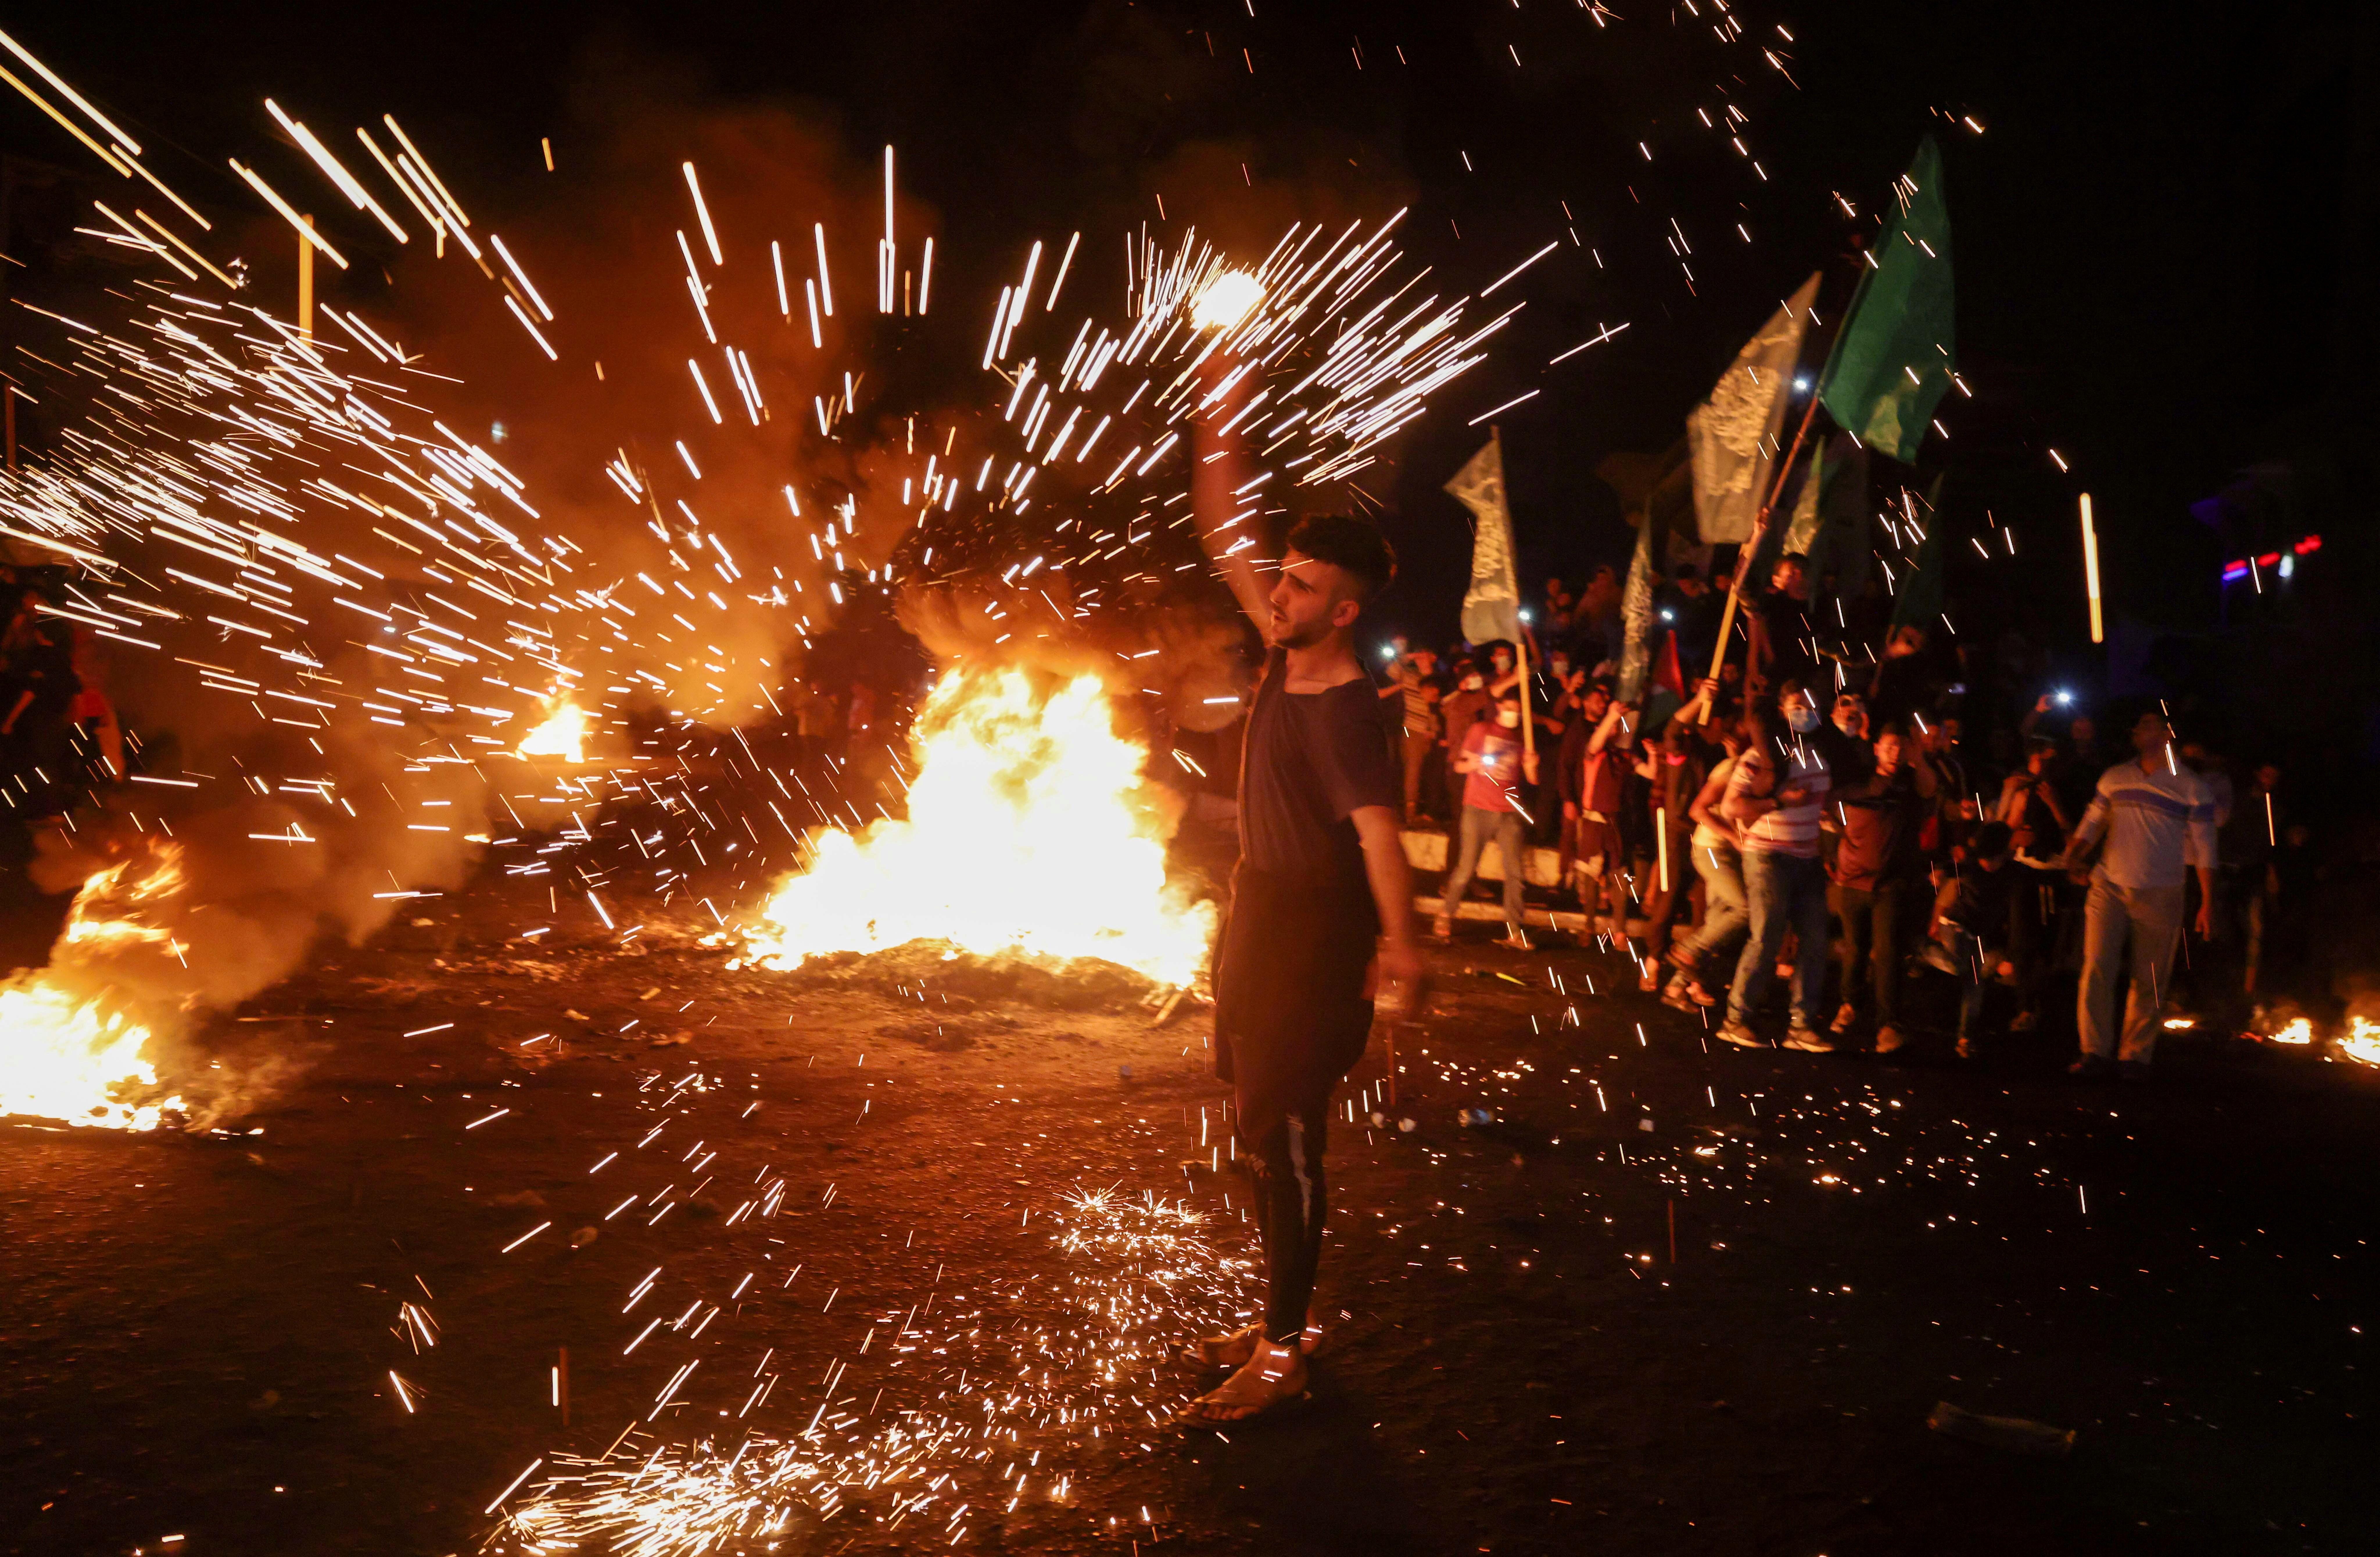 Prefeito de Mococa sanciona lei que proíbe queima de fogos de artifício